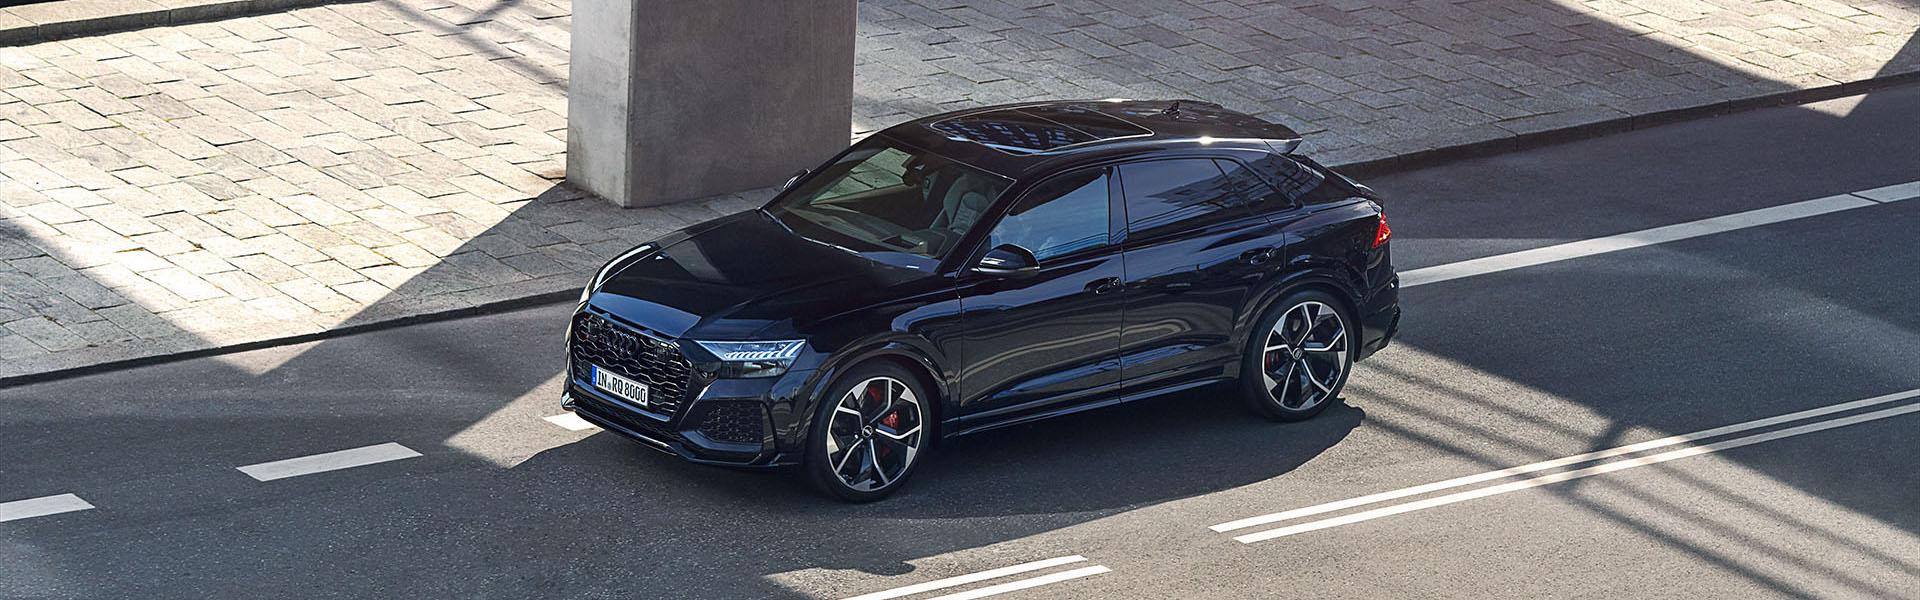 Audi RS Q8 na cesti